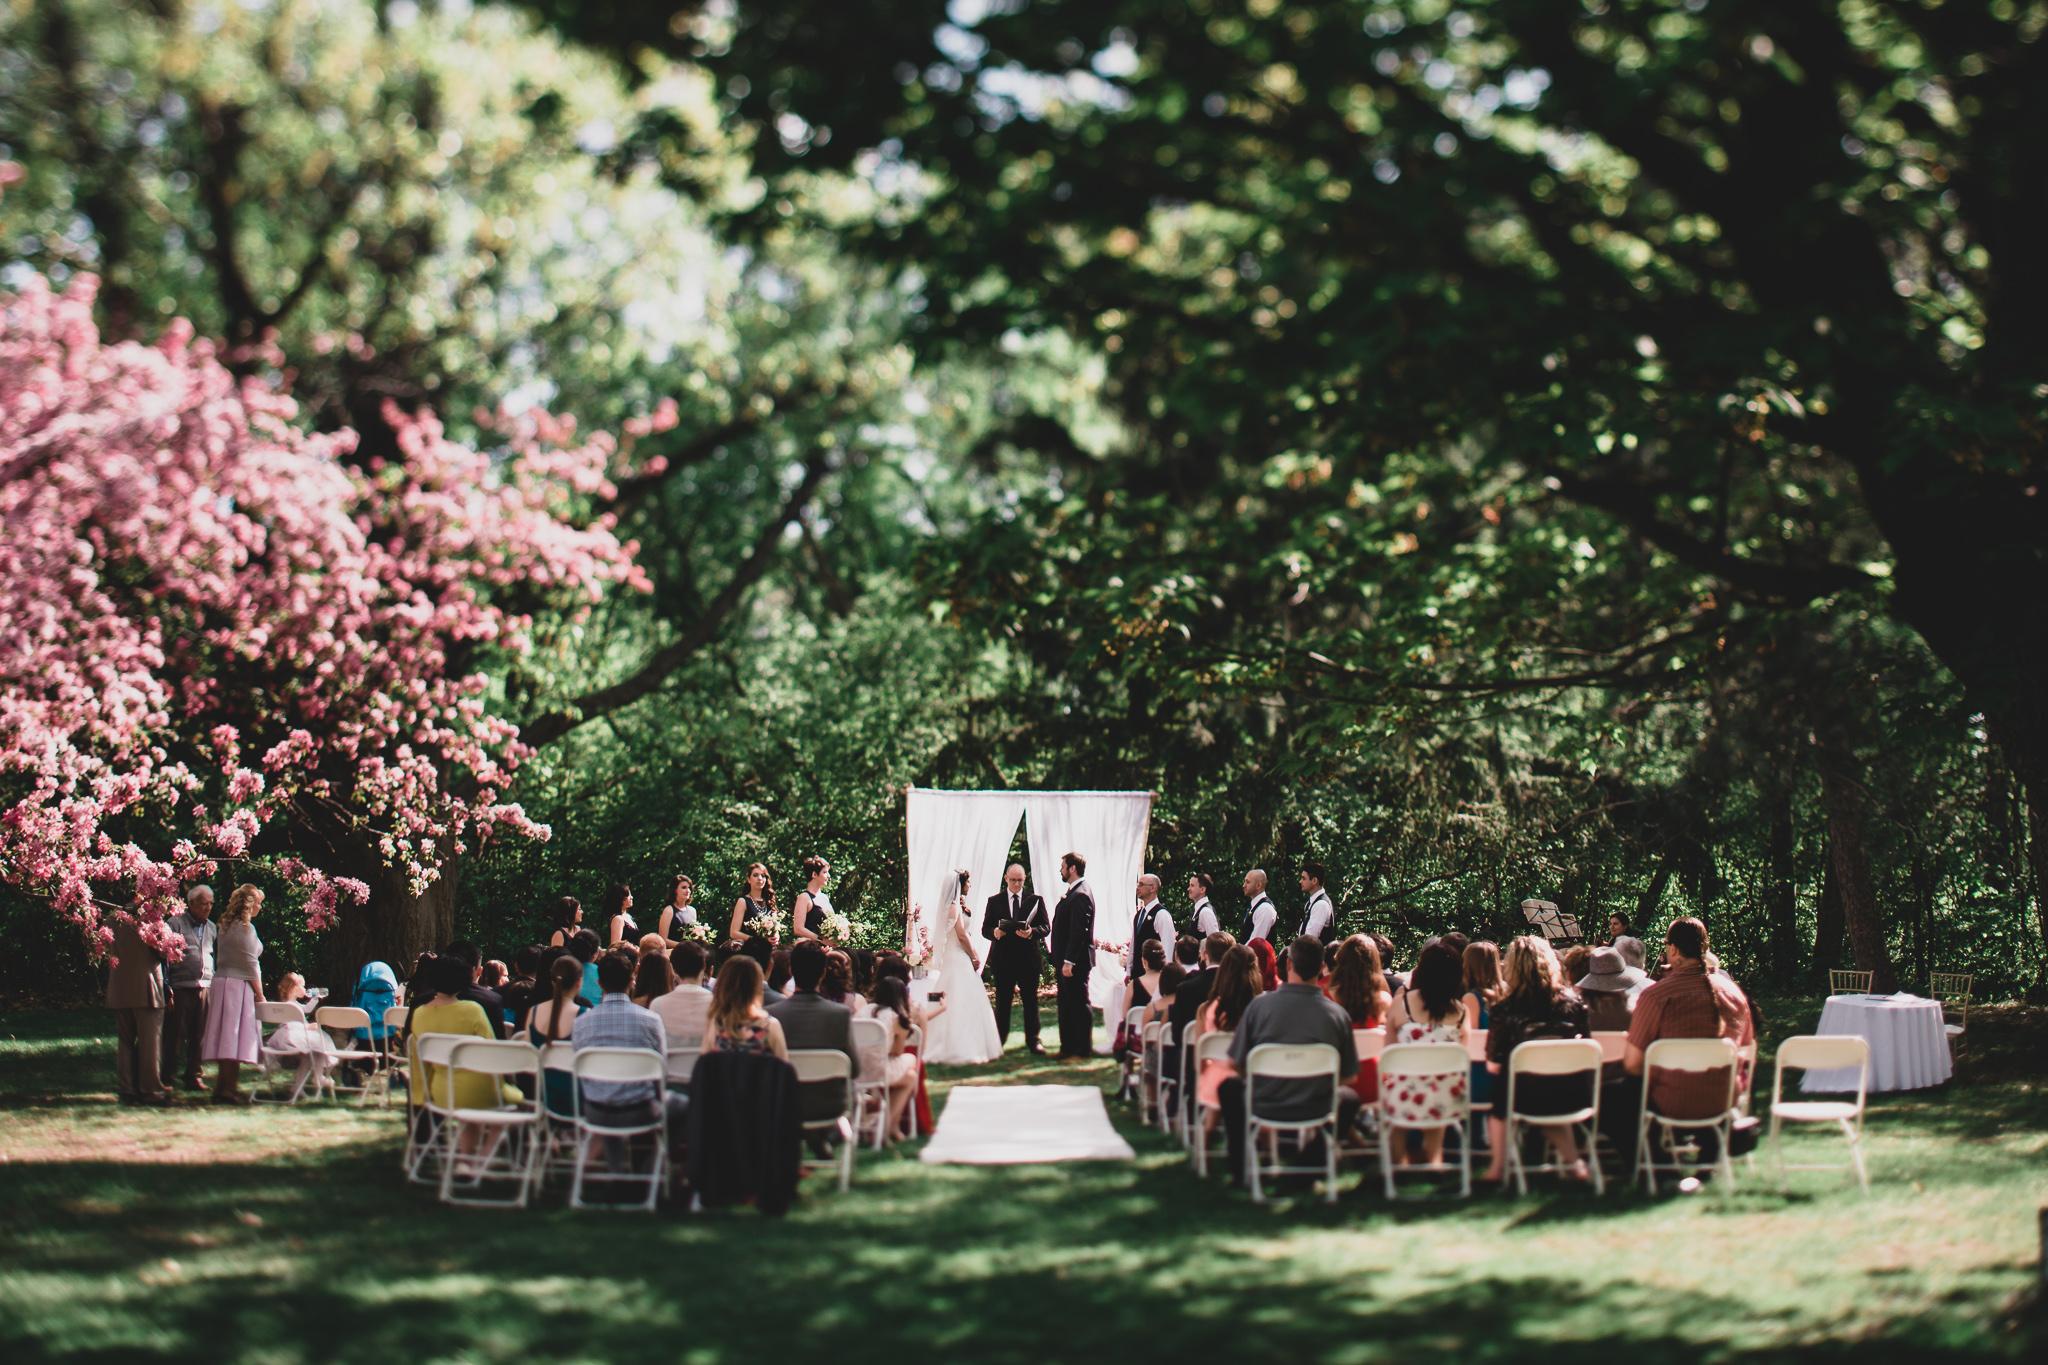 Spring wedding at Billings Estate Museum in Ottawa